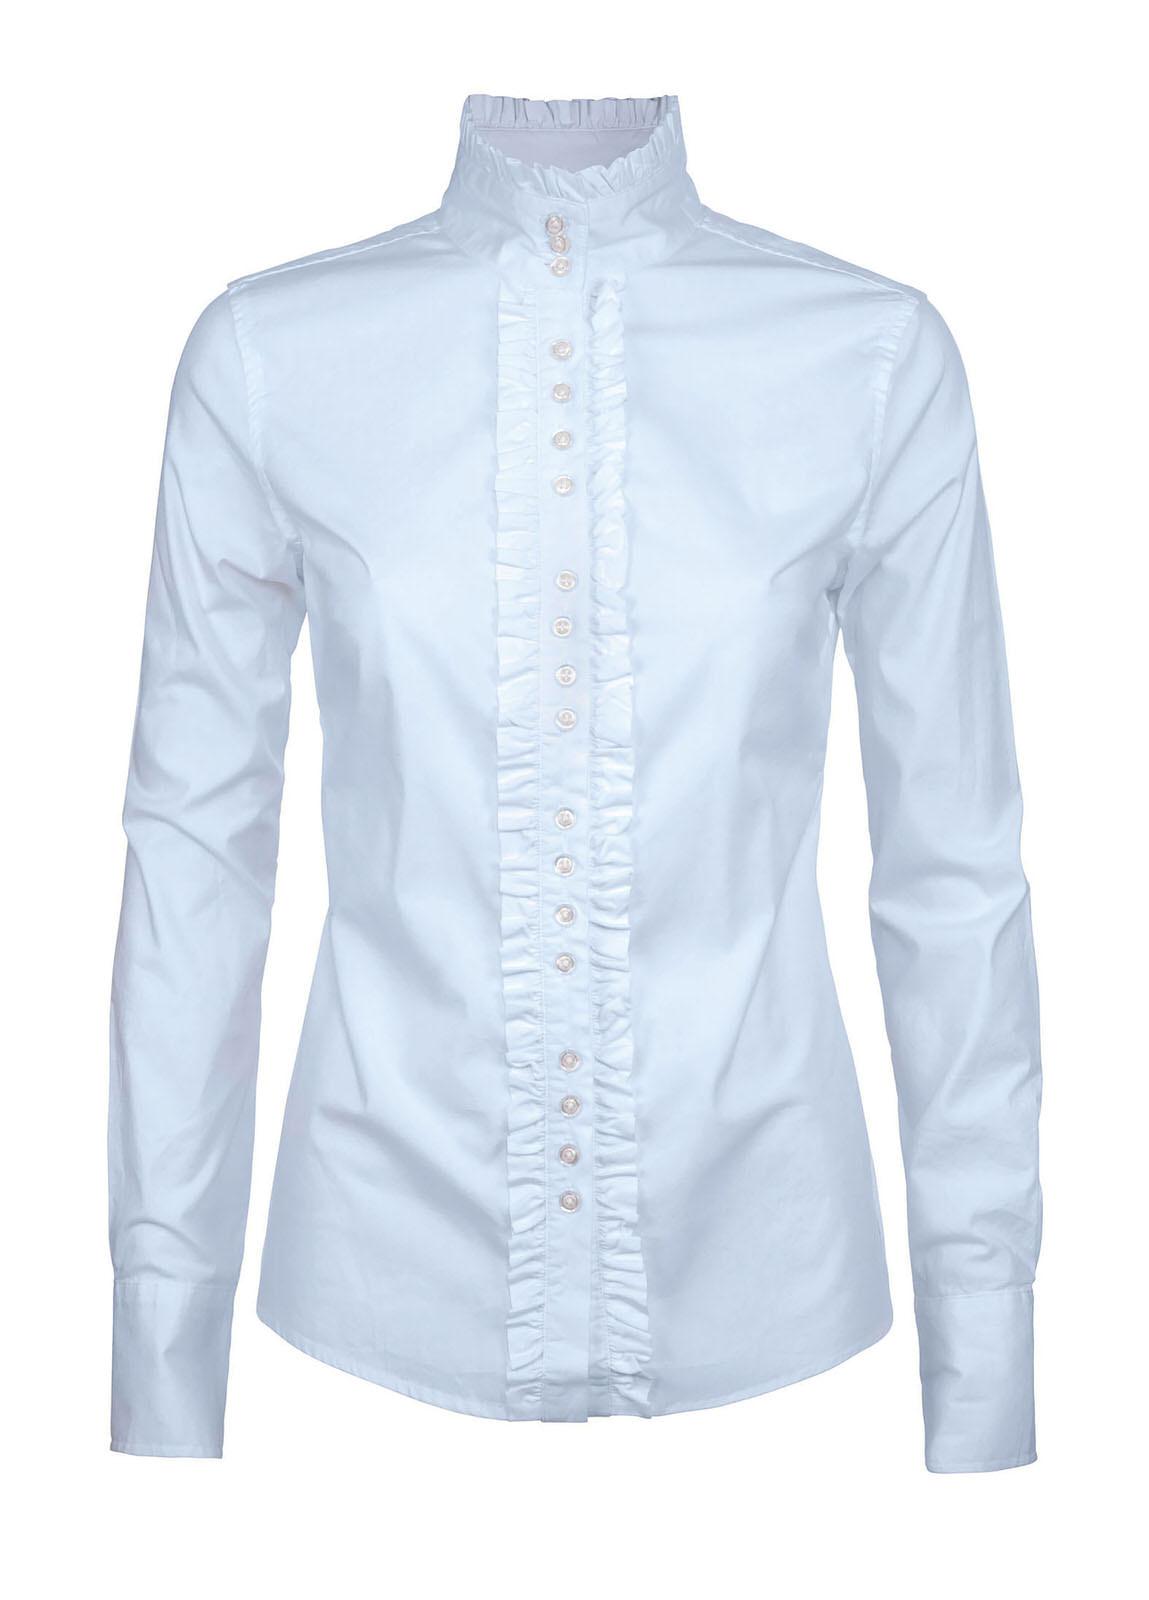 Chamomile_Shirt_Pale_Blue_Image_1